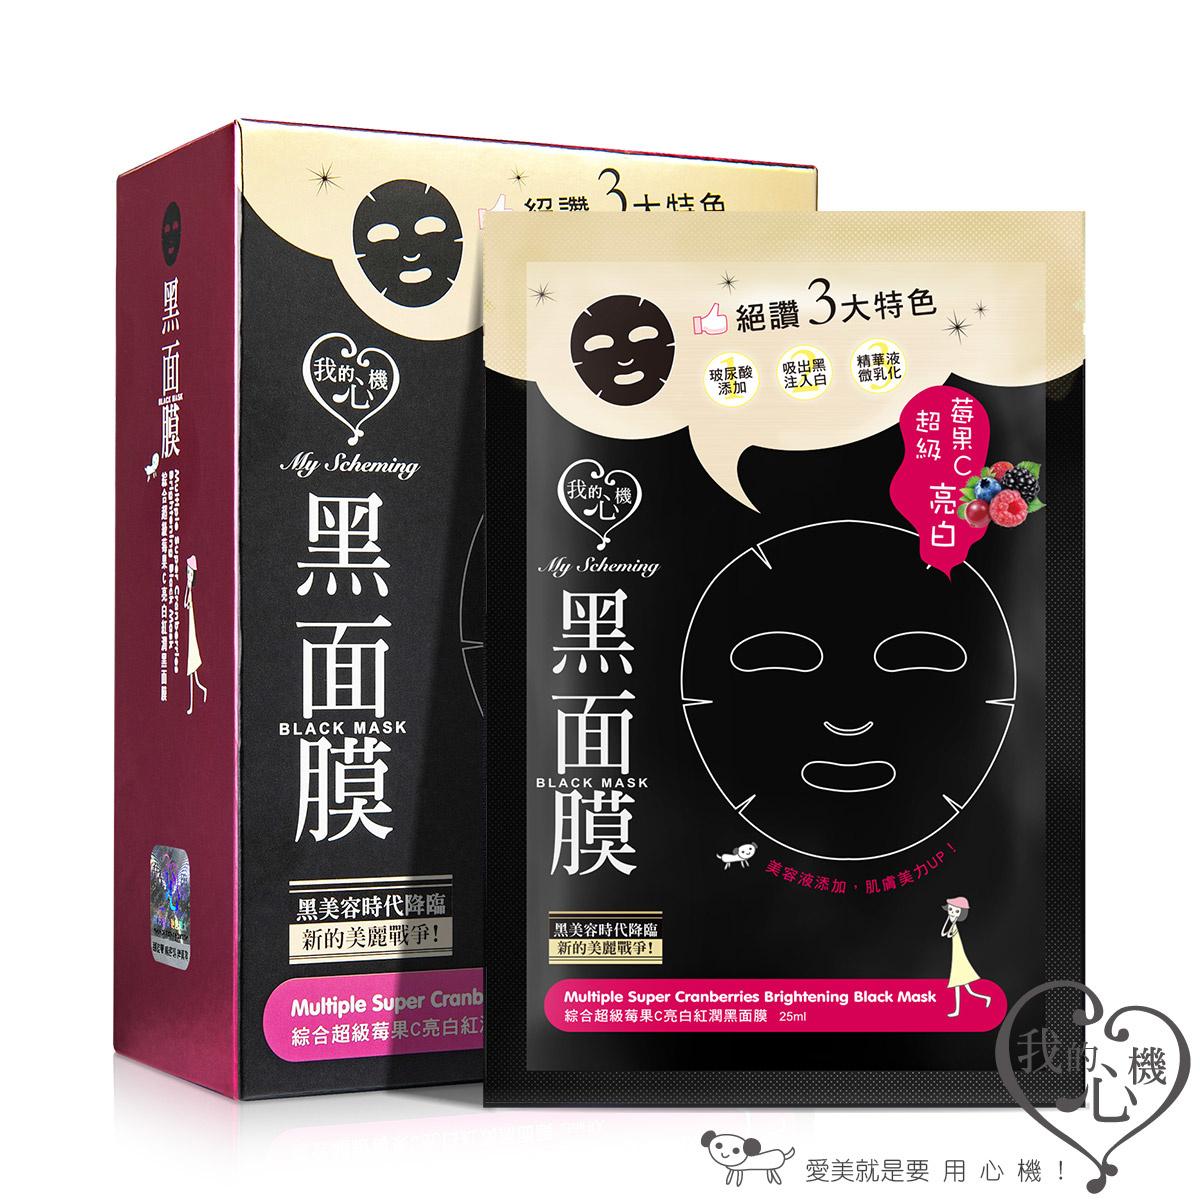 Multiple Super Cranberries Brightening Black Mask (8 Stk)-1